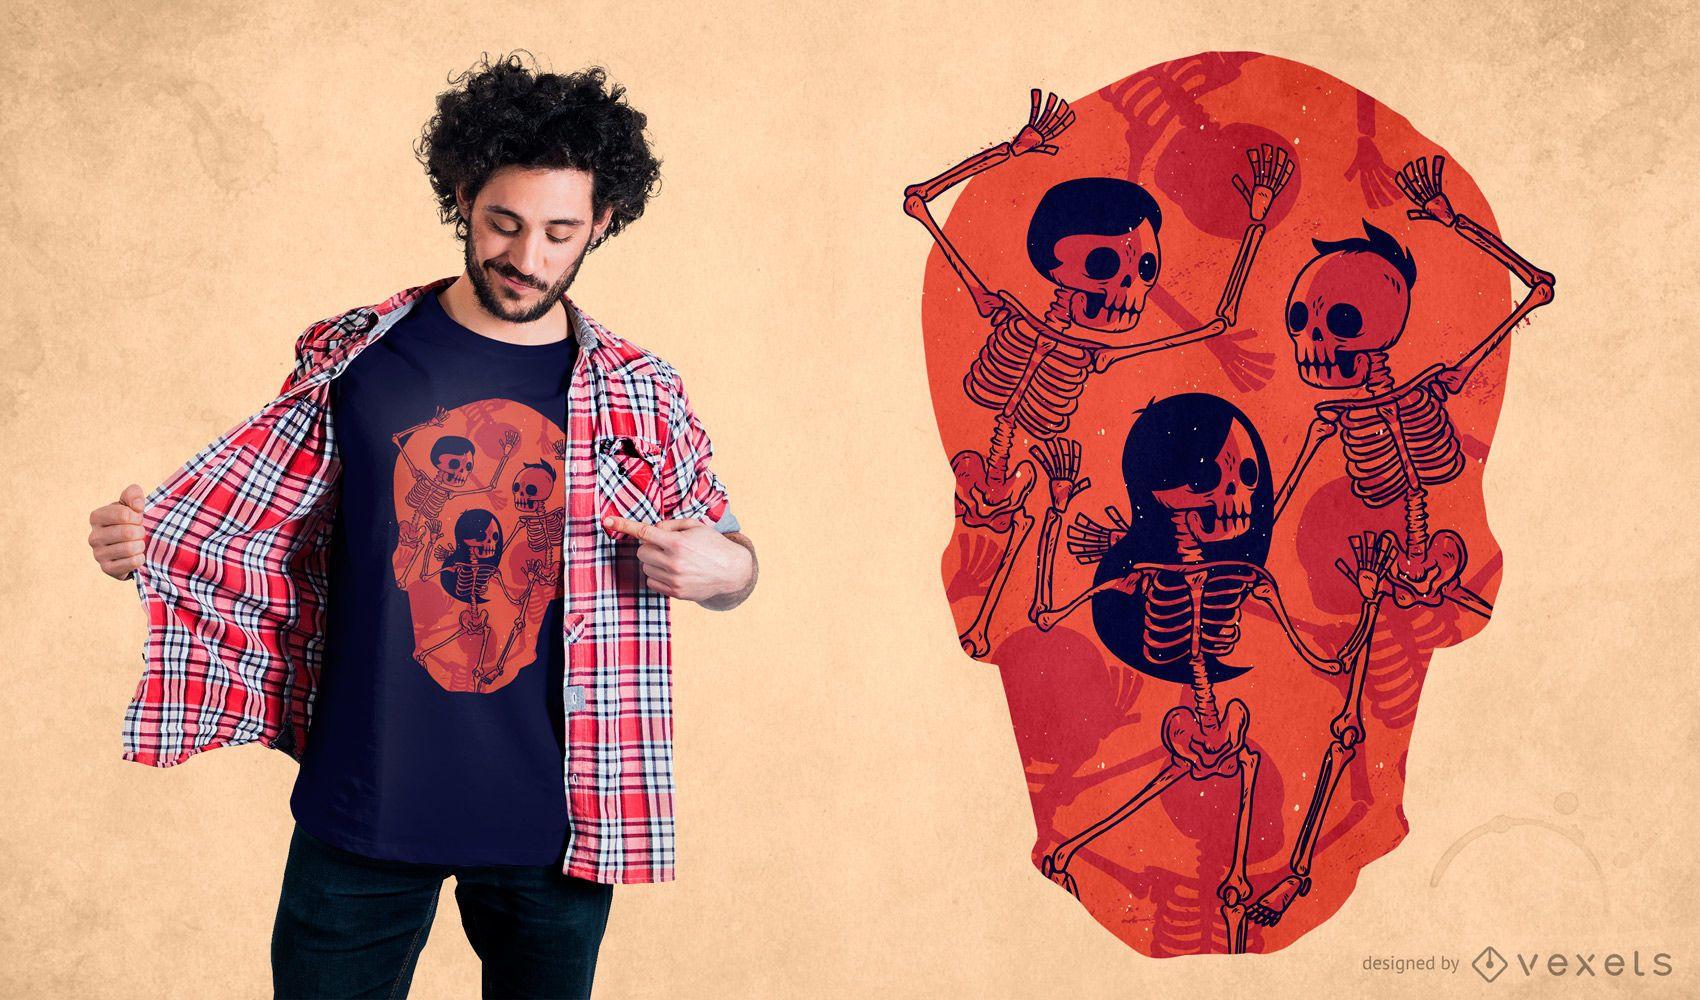 Skeleton spooky dance t-shirt design